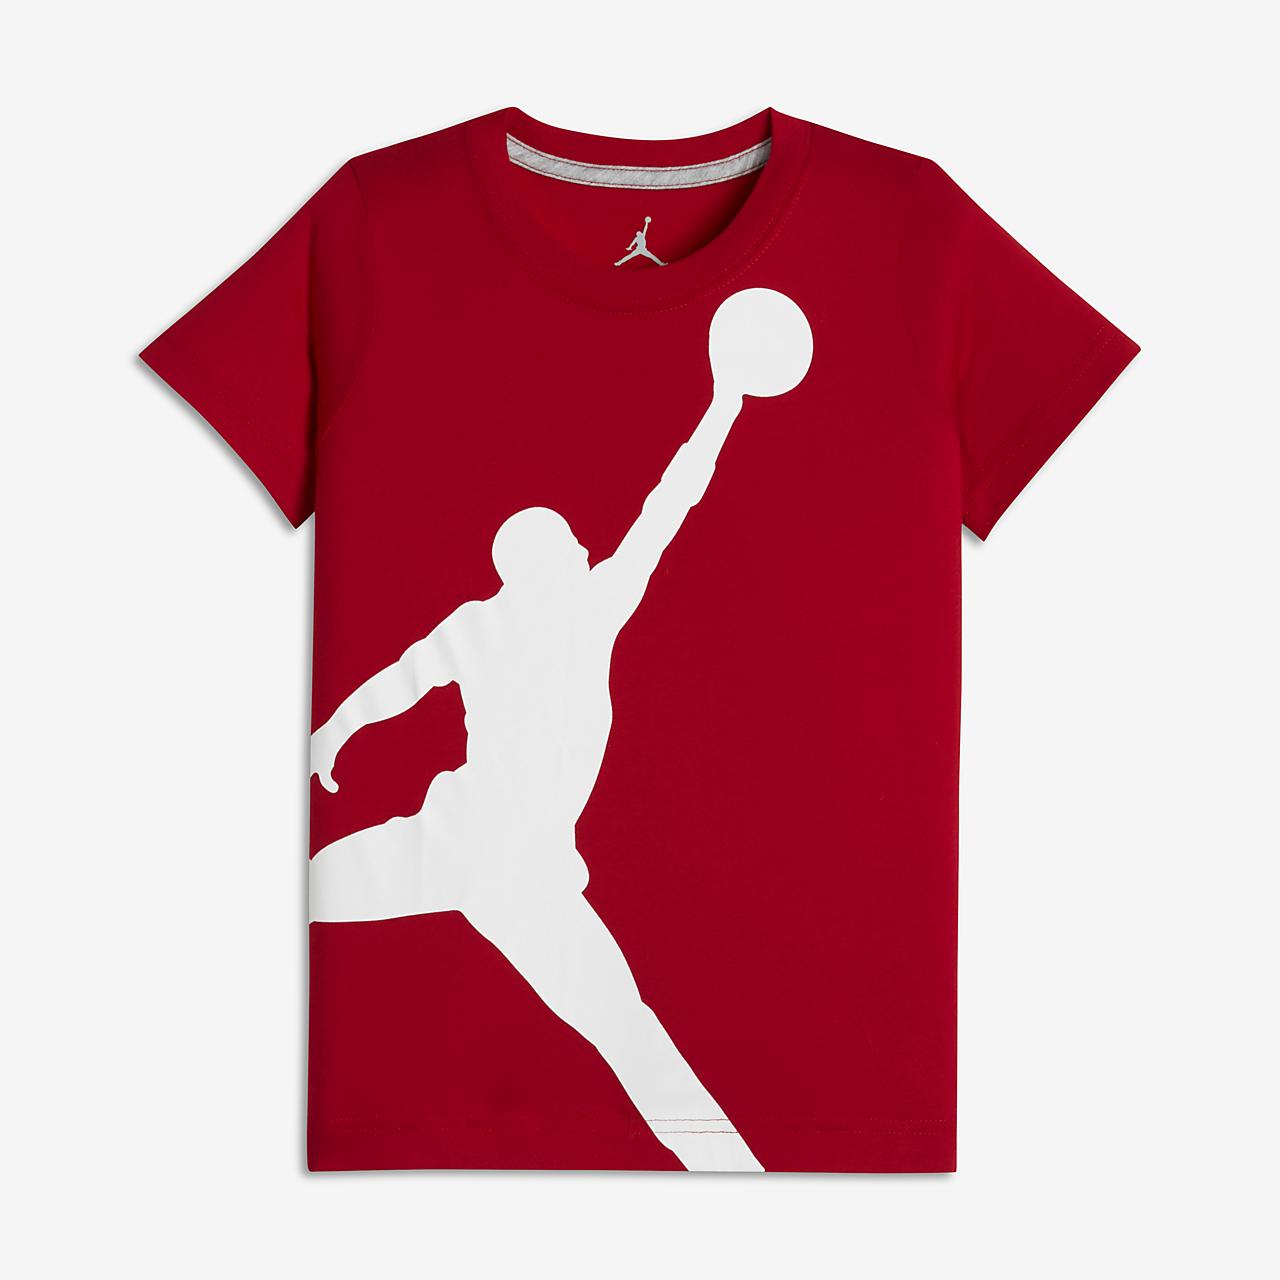 558a970f14 Jordan Jumbo Jumpman Camiseta - Niño pequeño. Nike.com ES